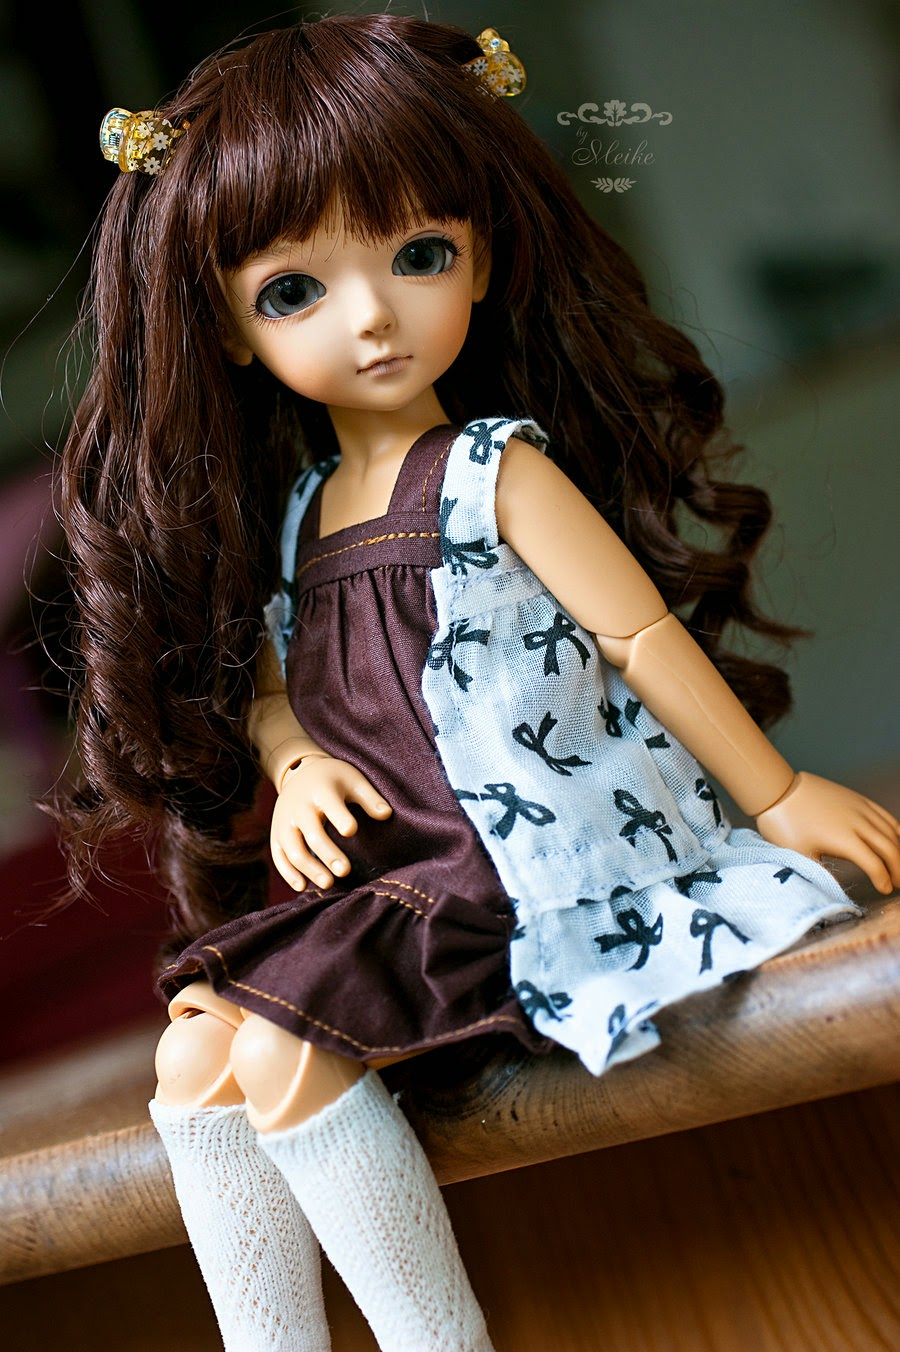 stylish cute dolls high definition photography wallpaper